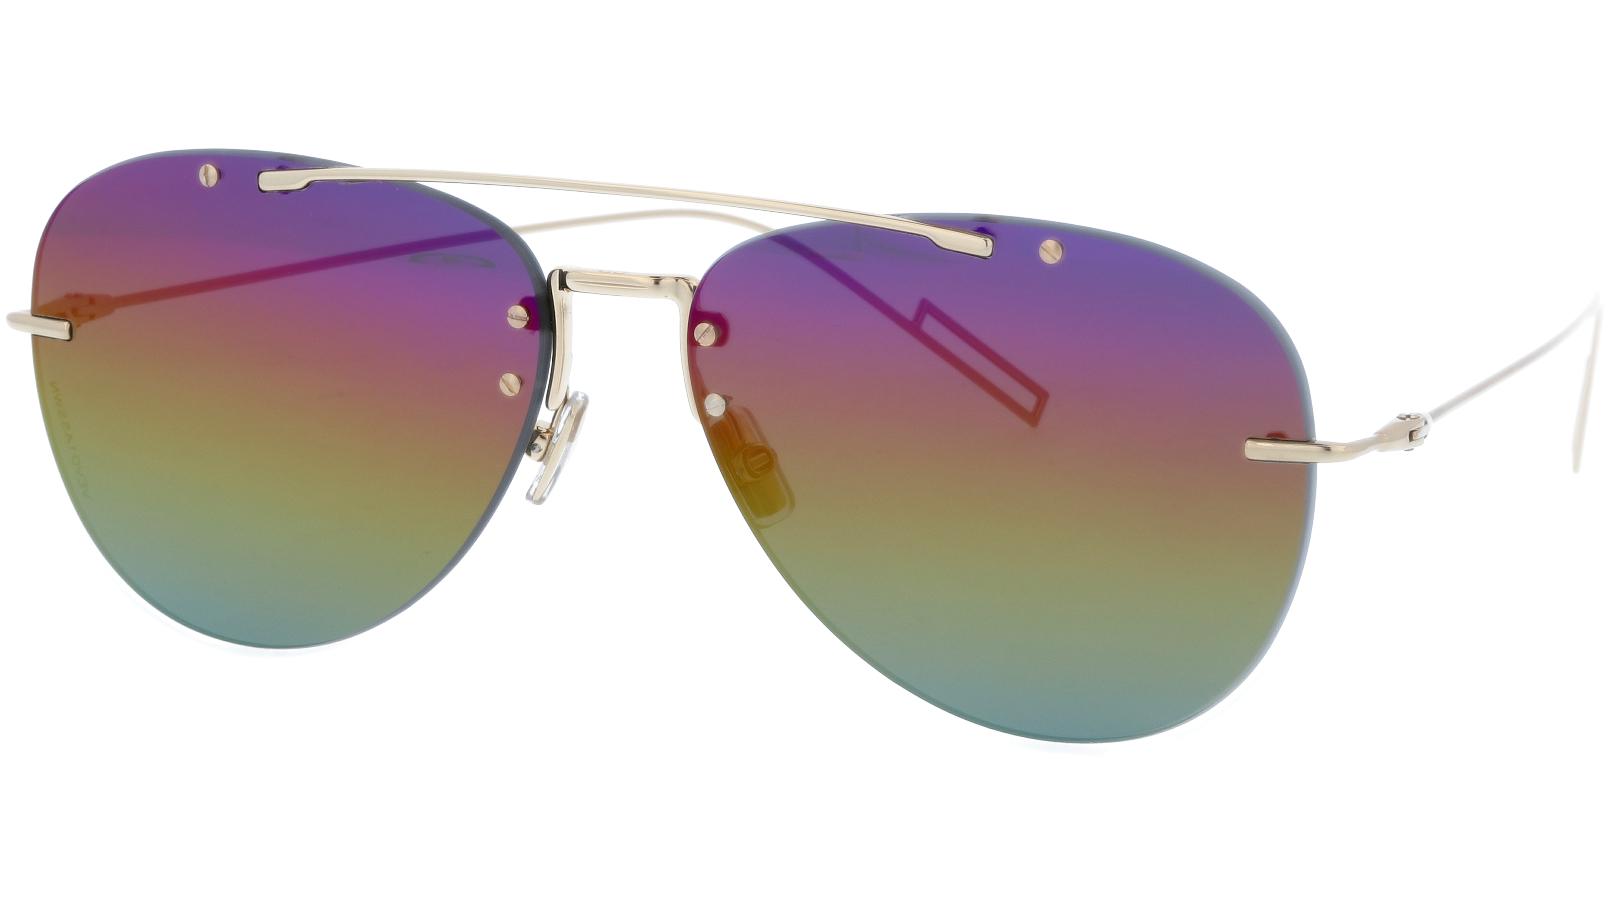 Dior CHROMA1F 3YGA9 62 LIGHT Sunglasses